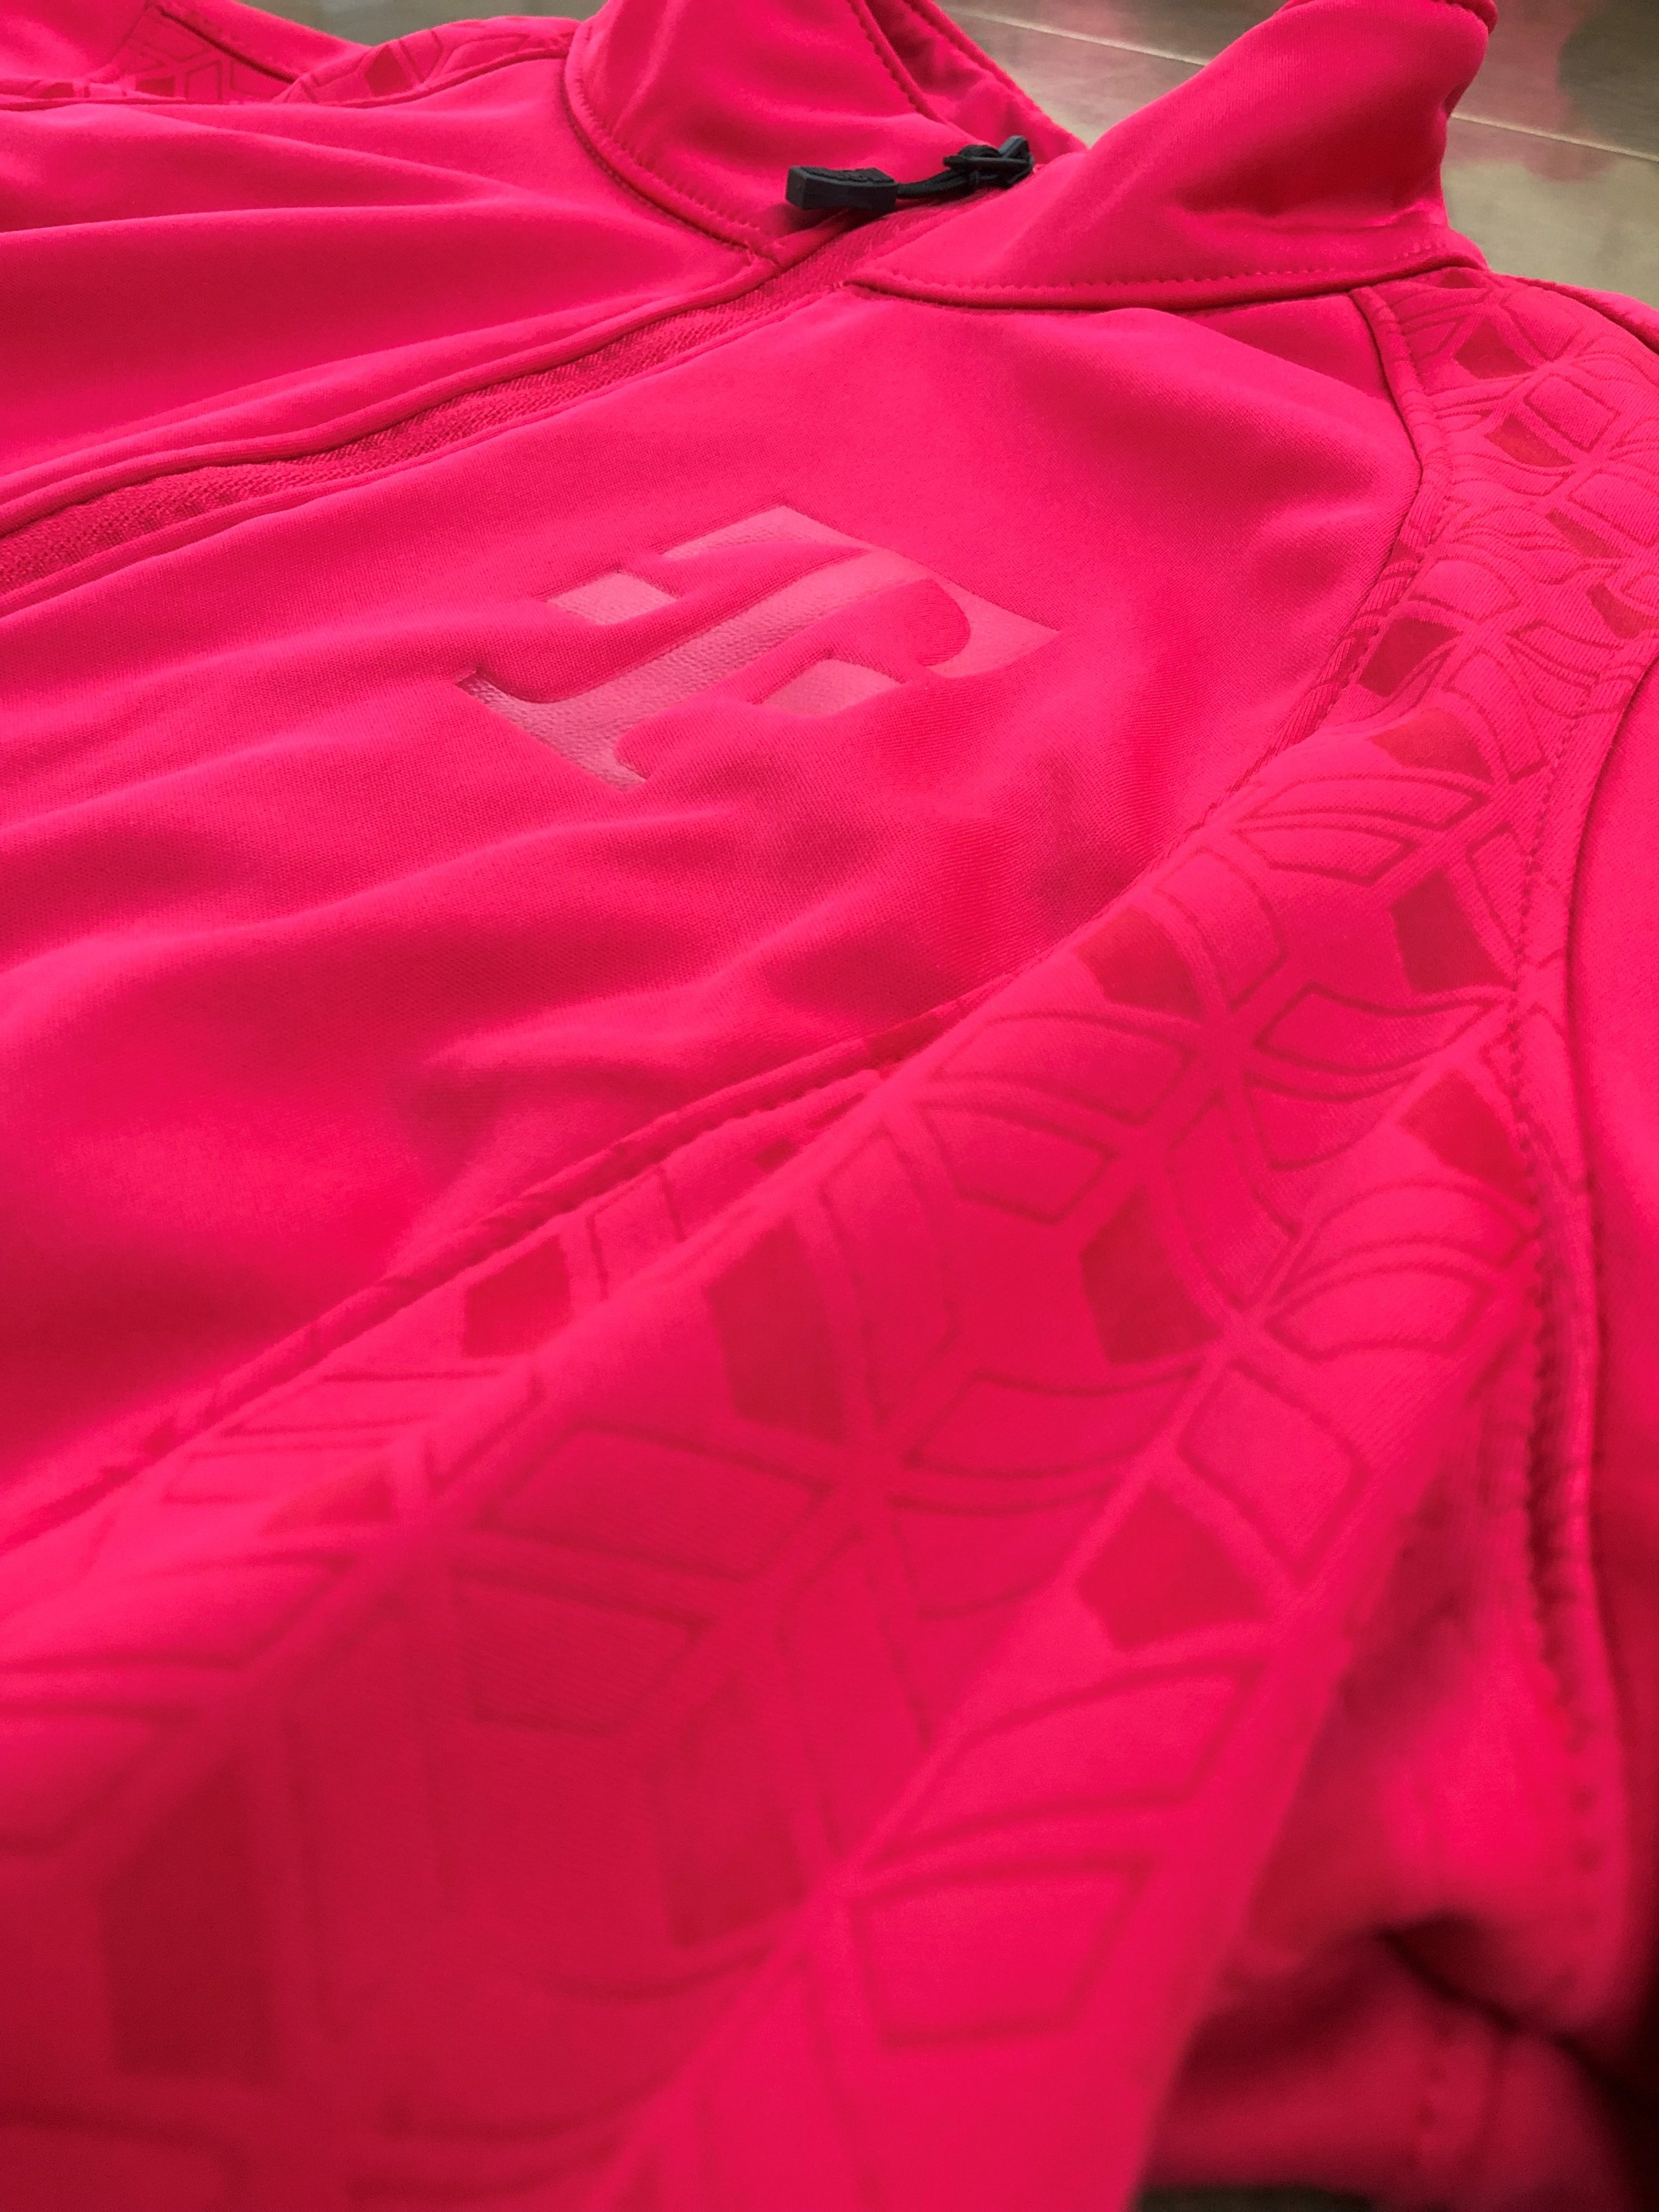 logounltd_laser_embroidery_screen_printing_apparel_uniform_custom_tshirts_kirkland_bellevue_seattle_redmond_branded_merchandise_promotional_products_logo_unltd_t_mobile_Tuesday_tmobile_un_carrier_magenta_5G_john_legere (1).jpg